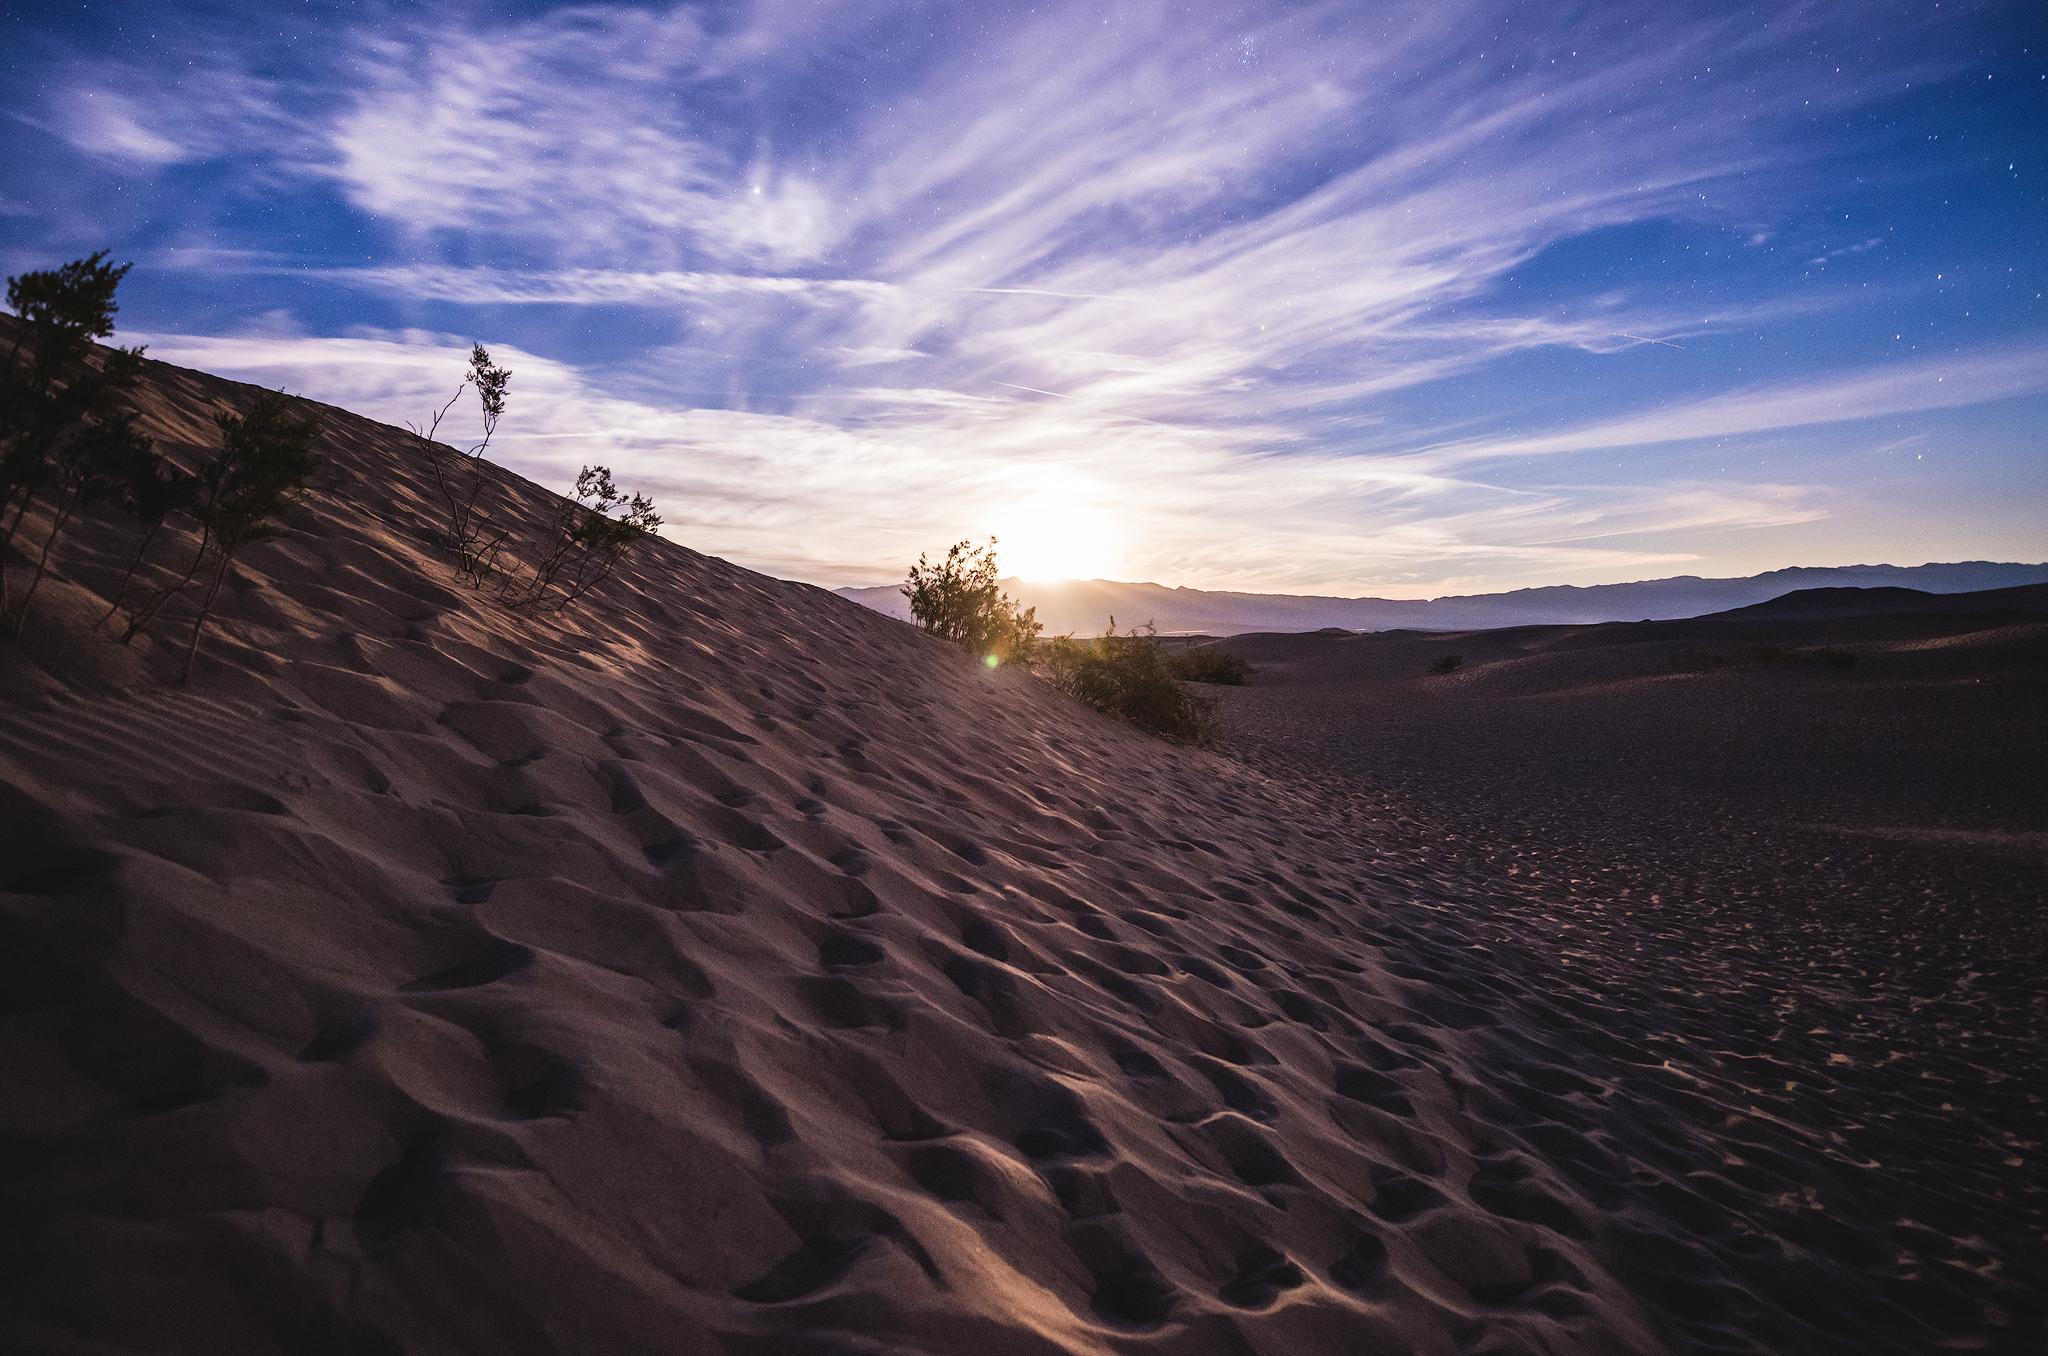 Infinite wonder - Death Valley National Park, California